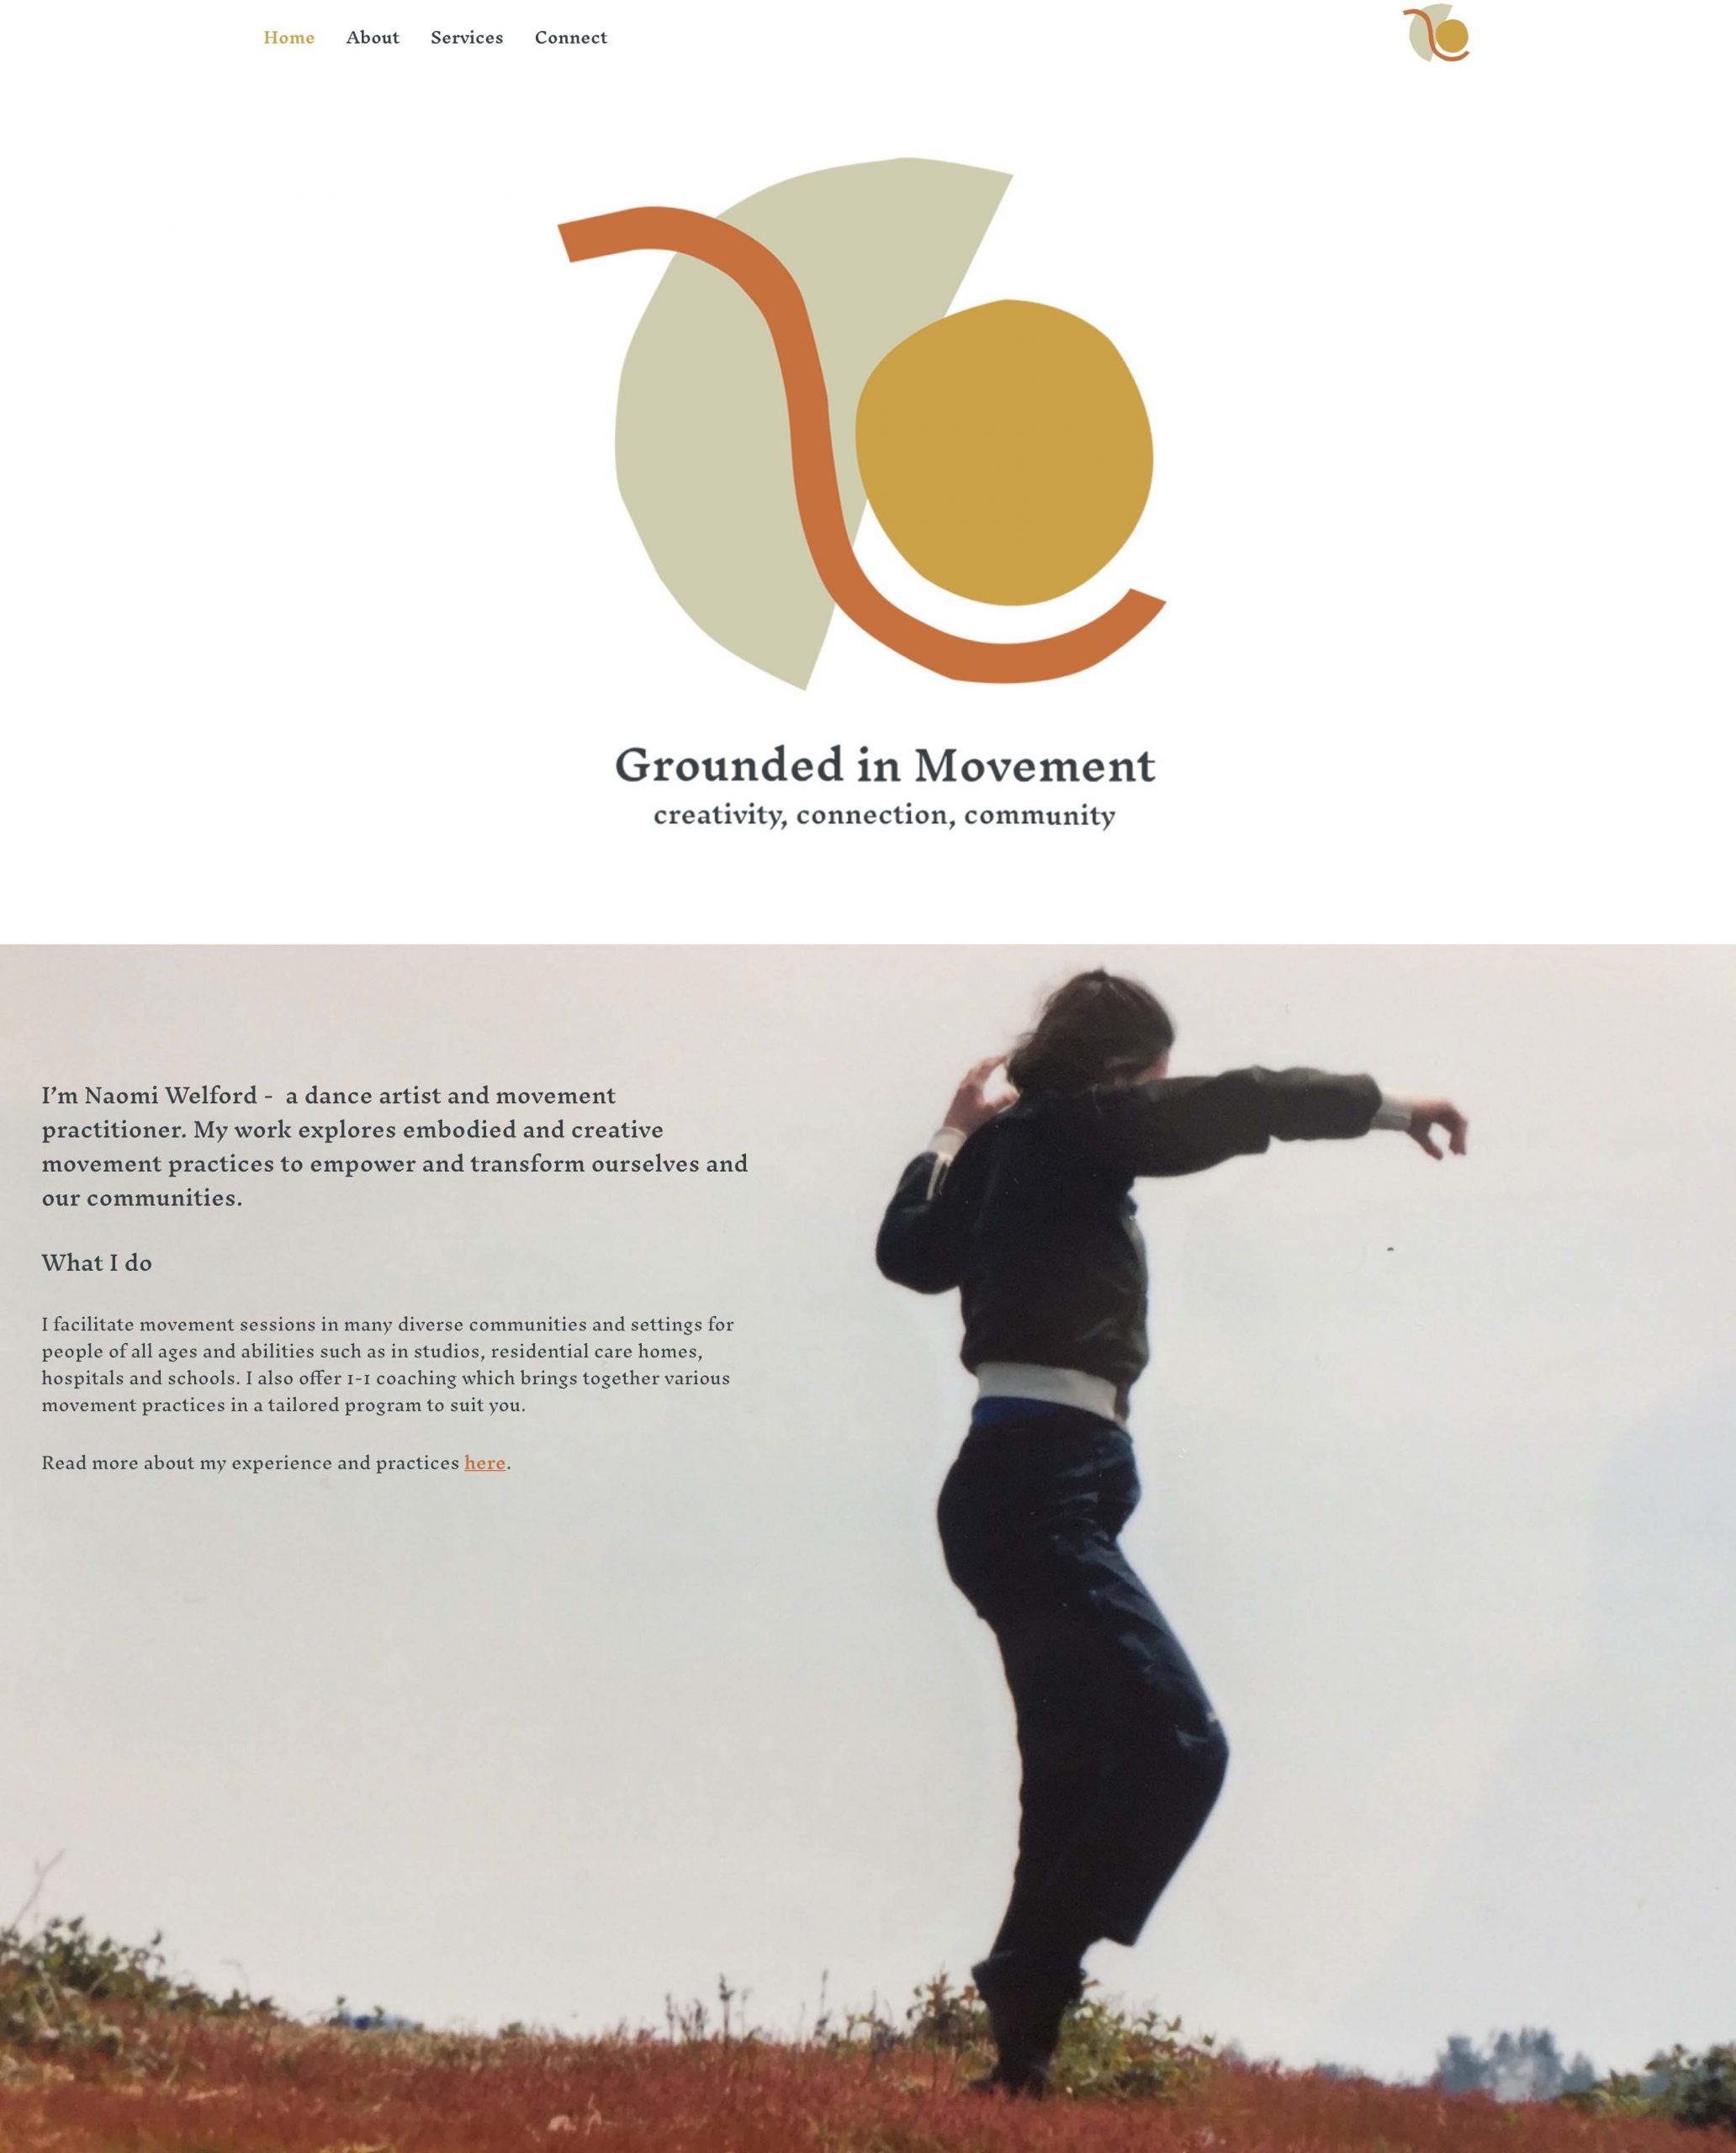 screencapture-groundedinmovement-co-2021-06-28-14_28_31